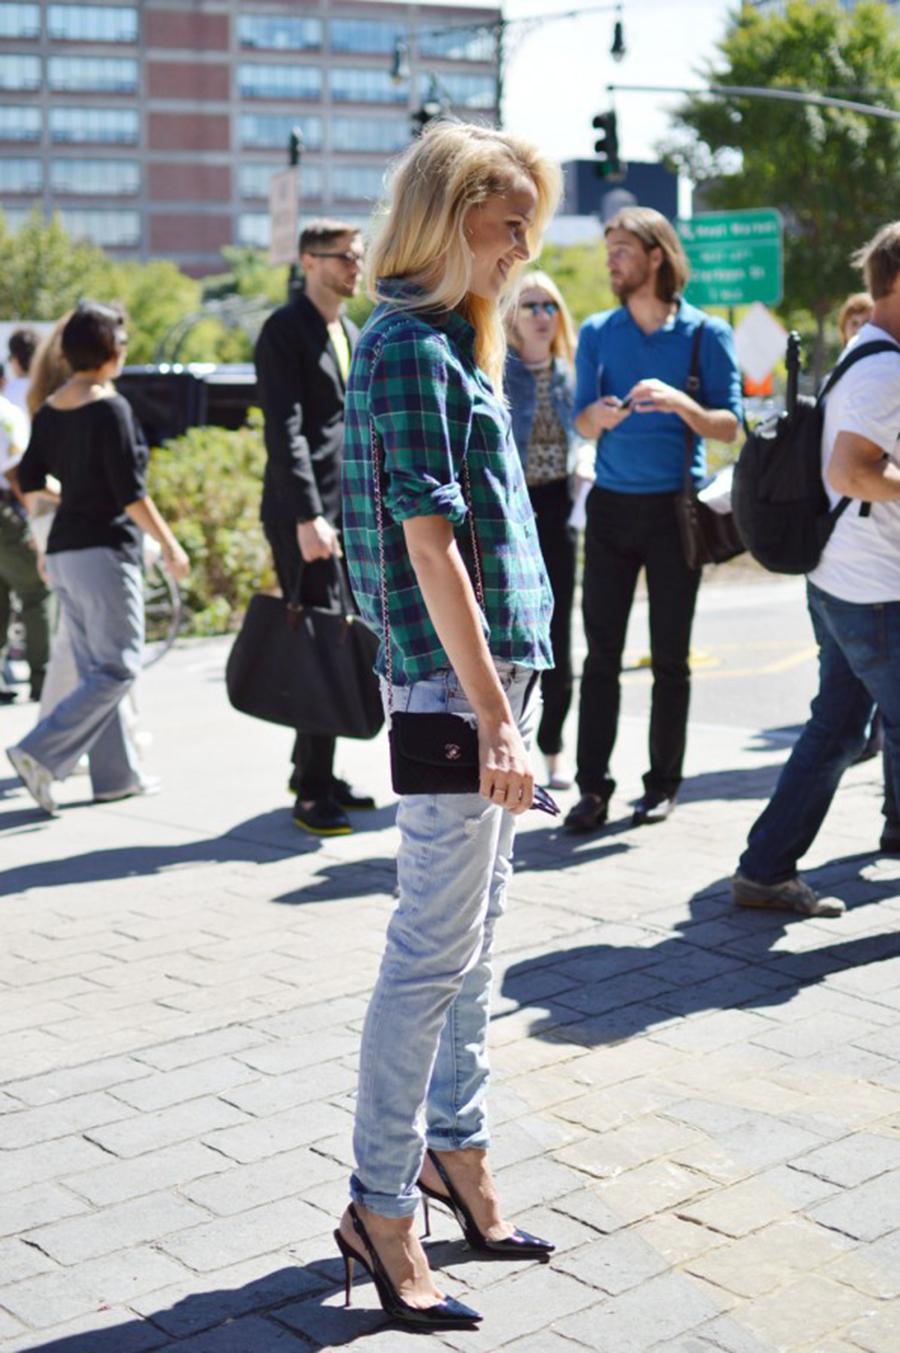 la-modella-mafia-model-off-duty-street-style-elin-kling-in-a-whyred-plaid-shirt-chanel-bag-and-manolo-pumps